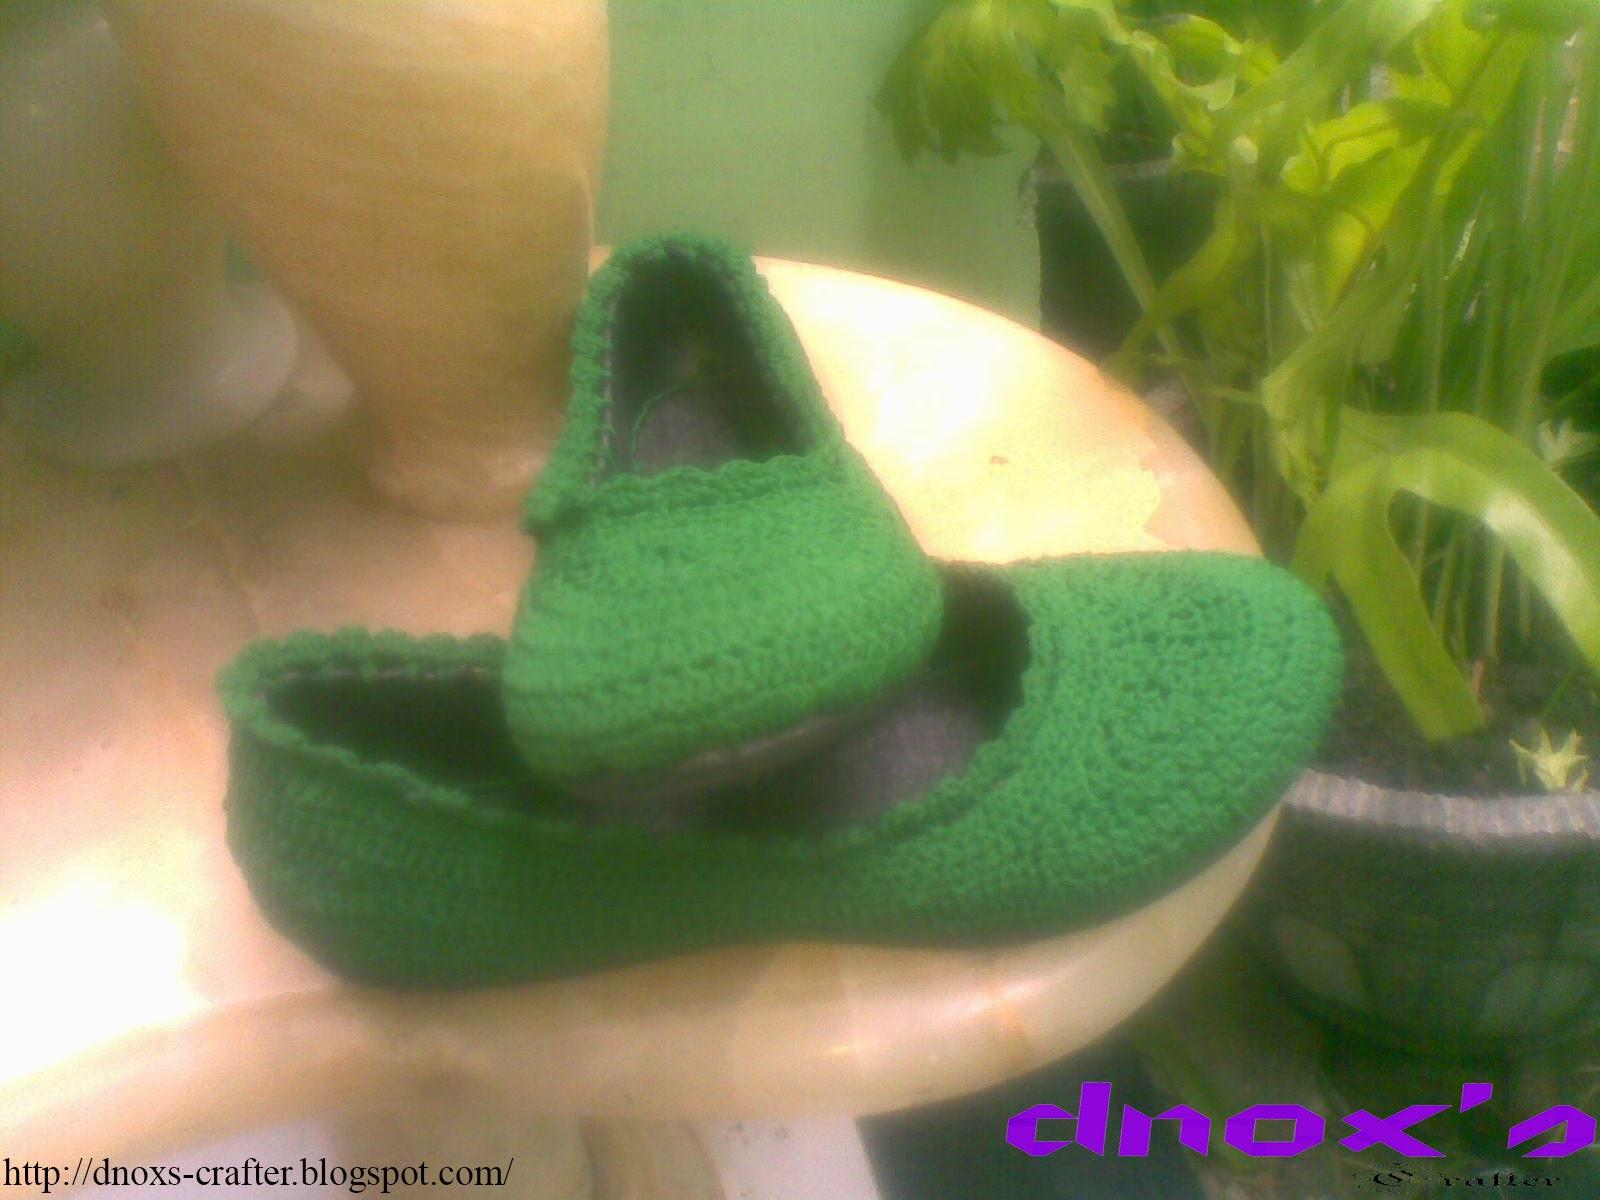 Sepatu rajut karet hijau